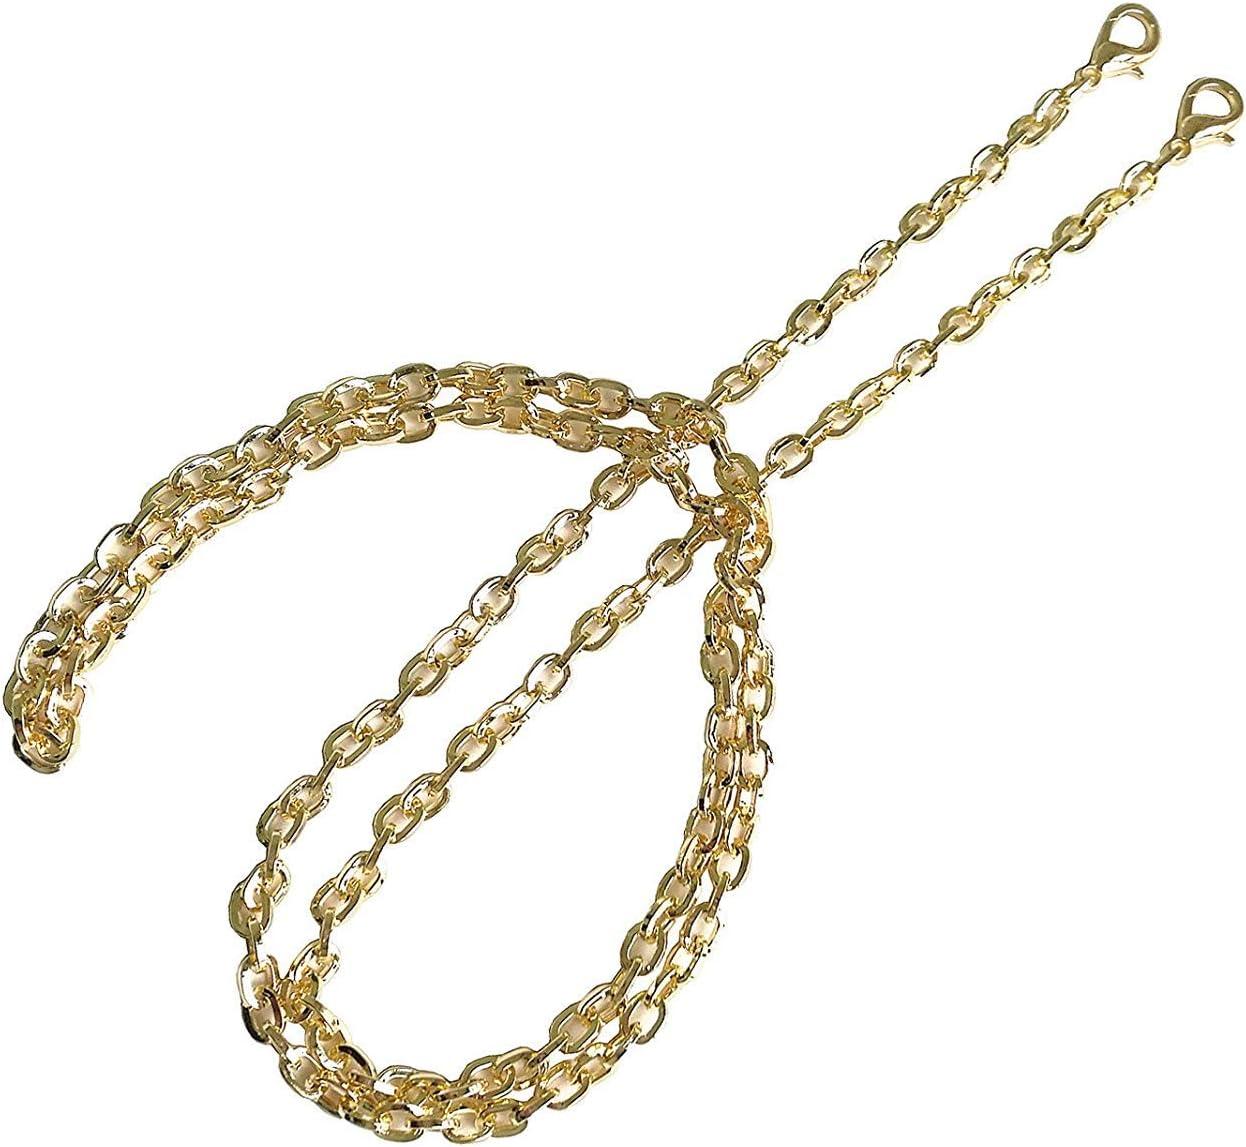 BG02 purse metal chain strap replacement gold crossbody shoulder strap handbag